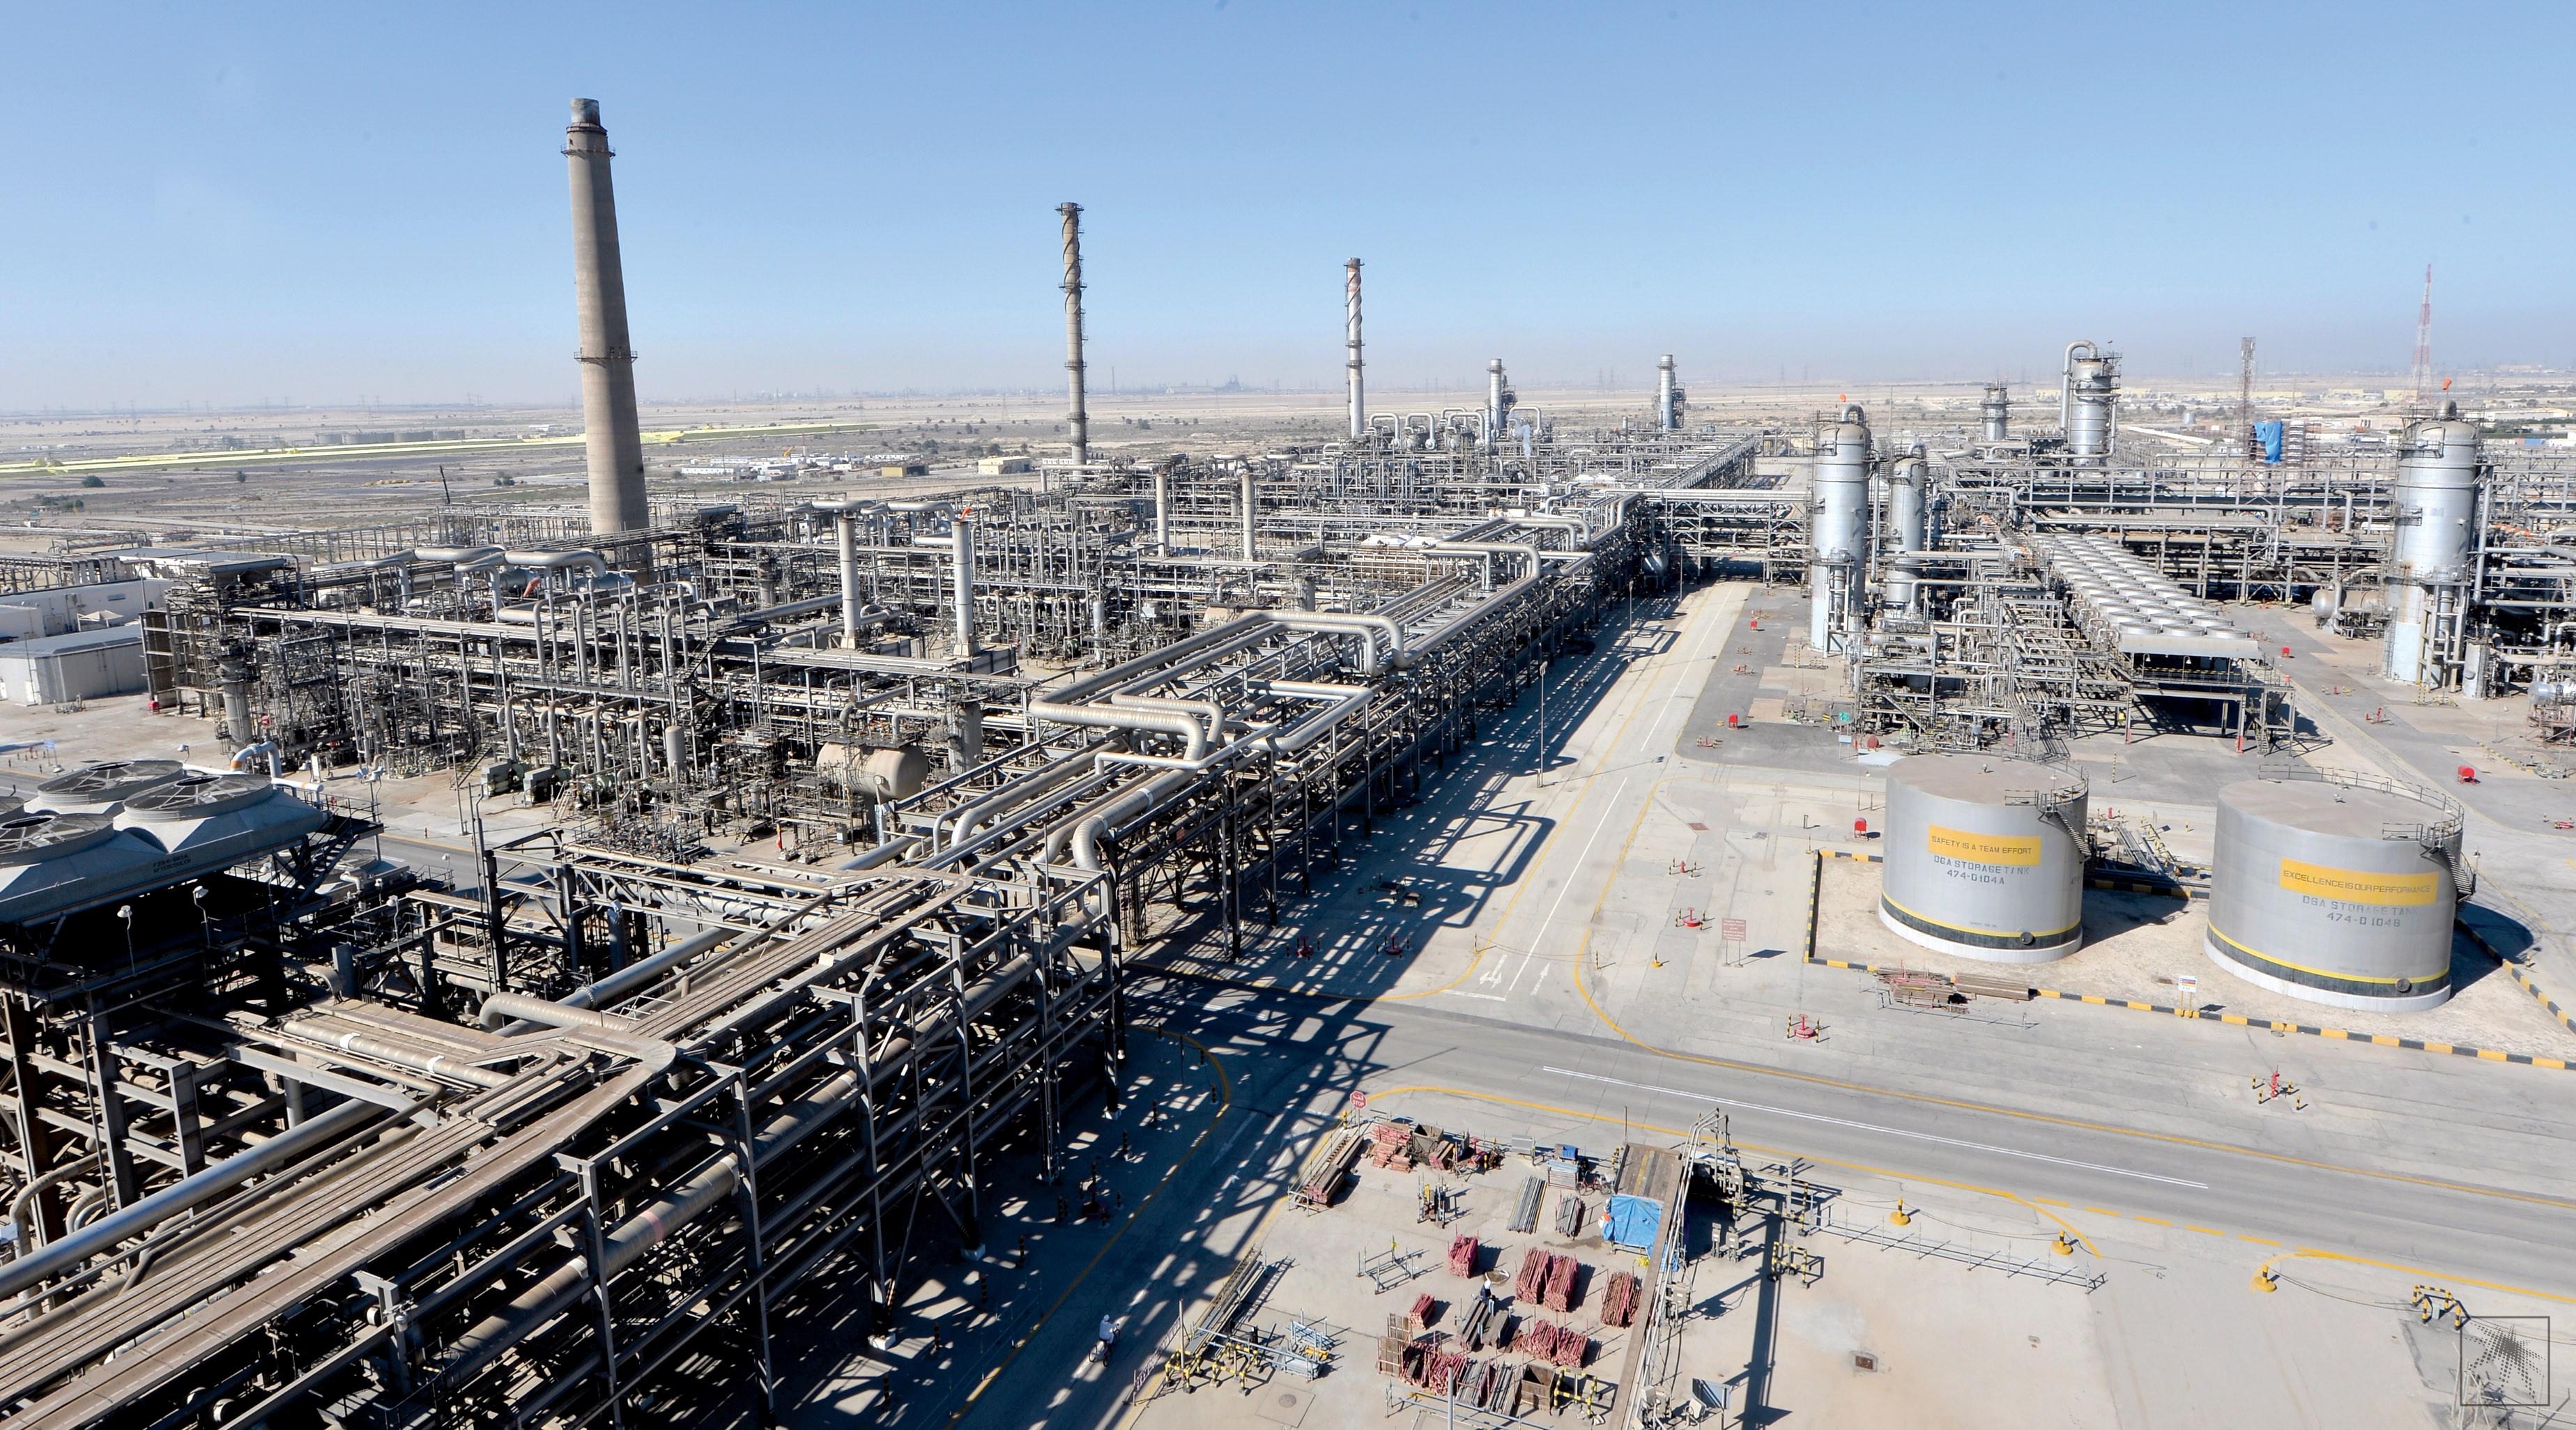 Sempra, Saudi Aramco sign heads of agreement on Port Arthur LNG